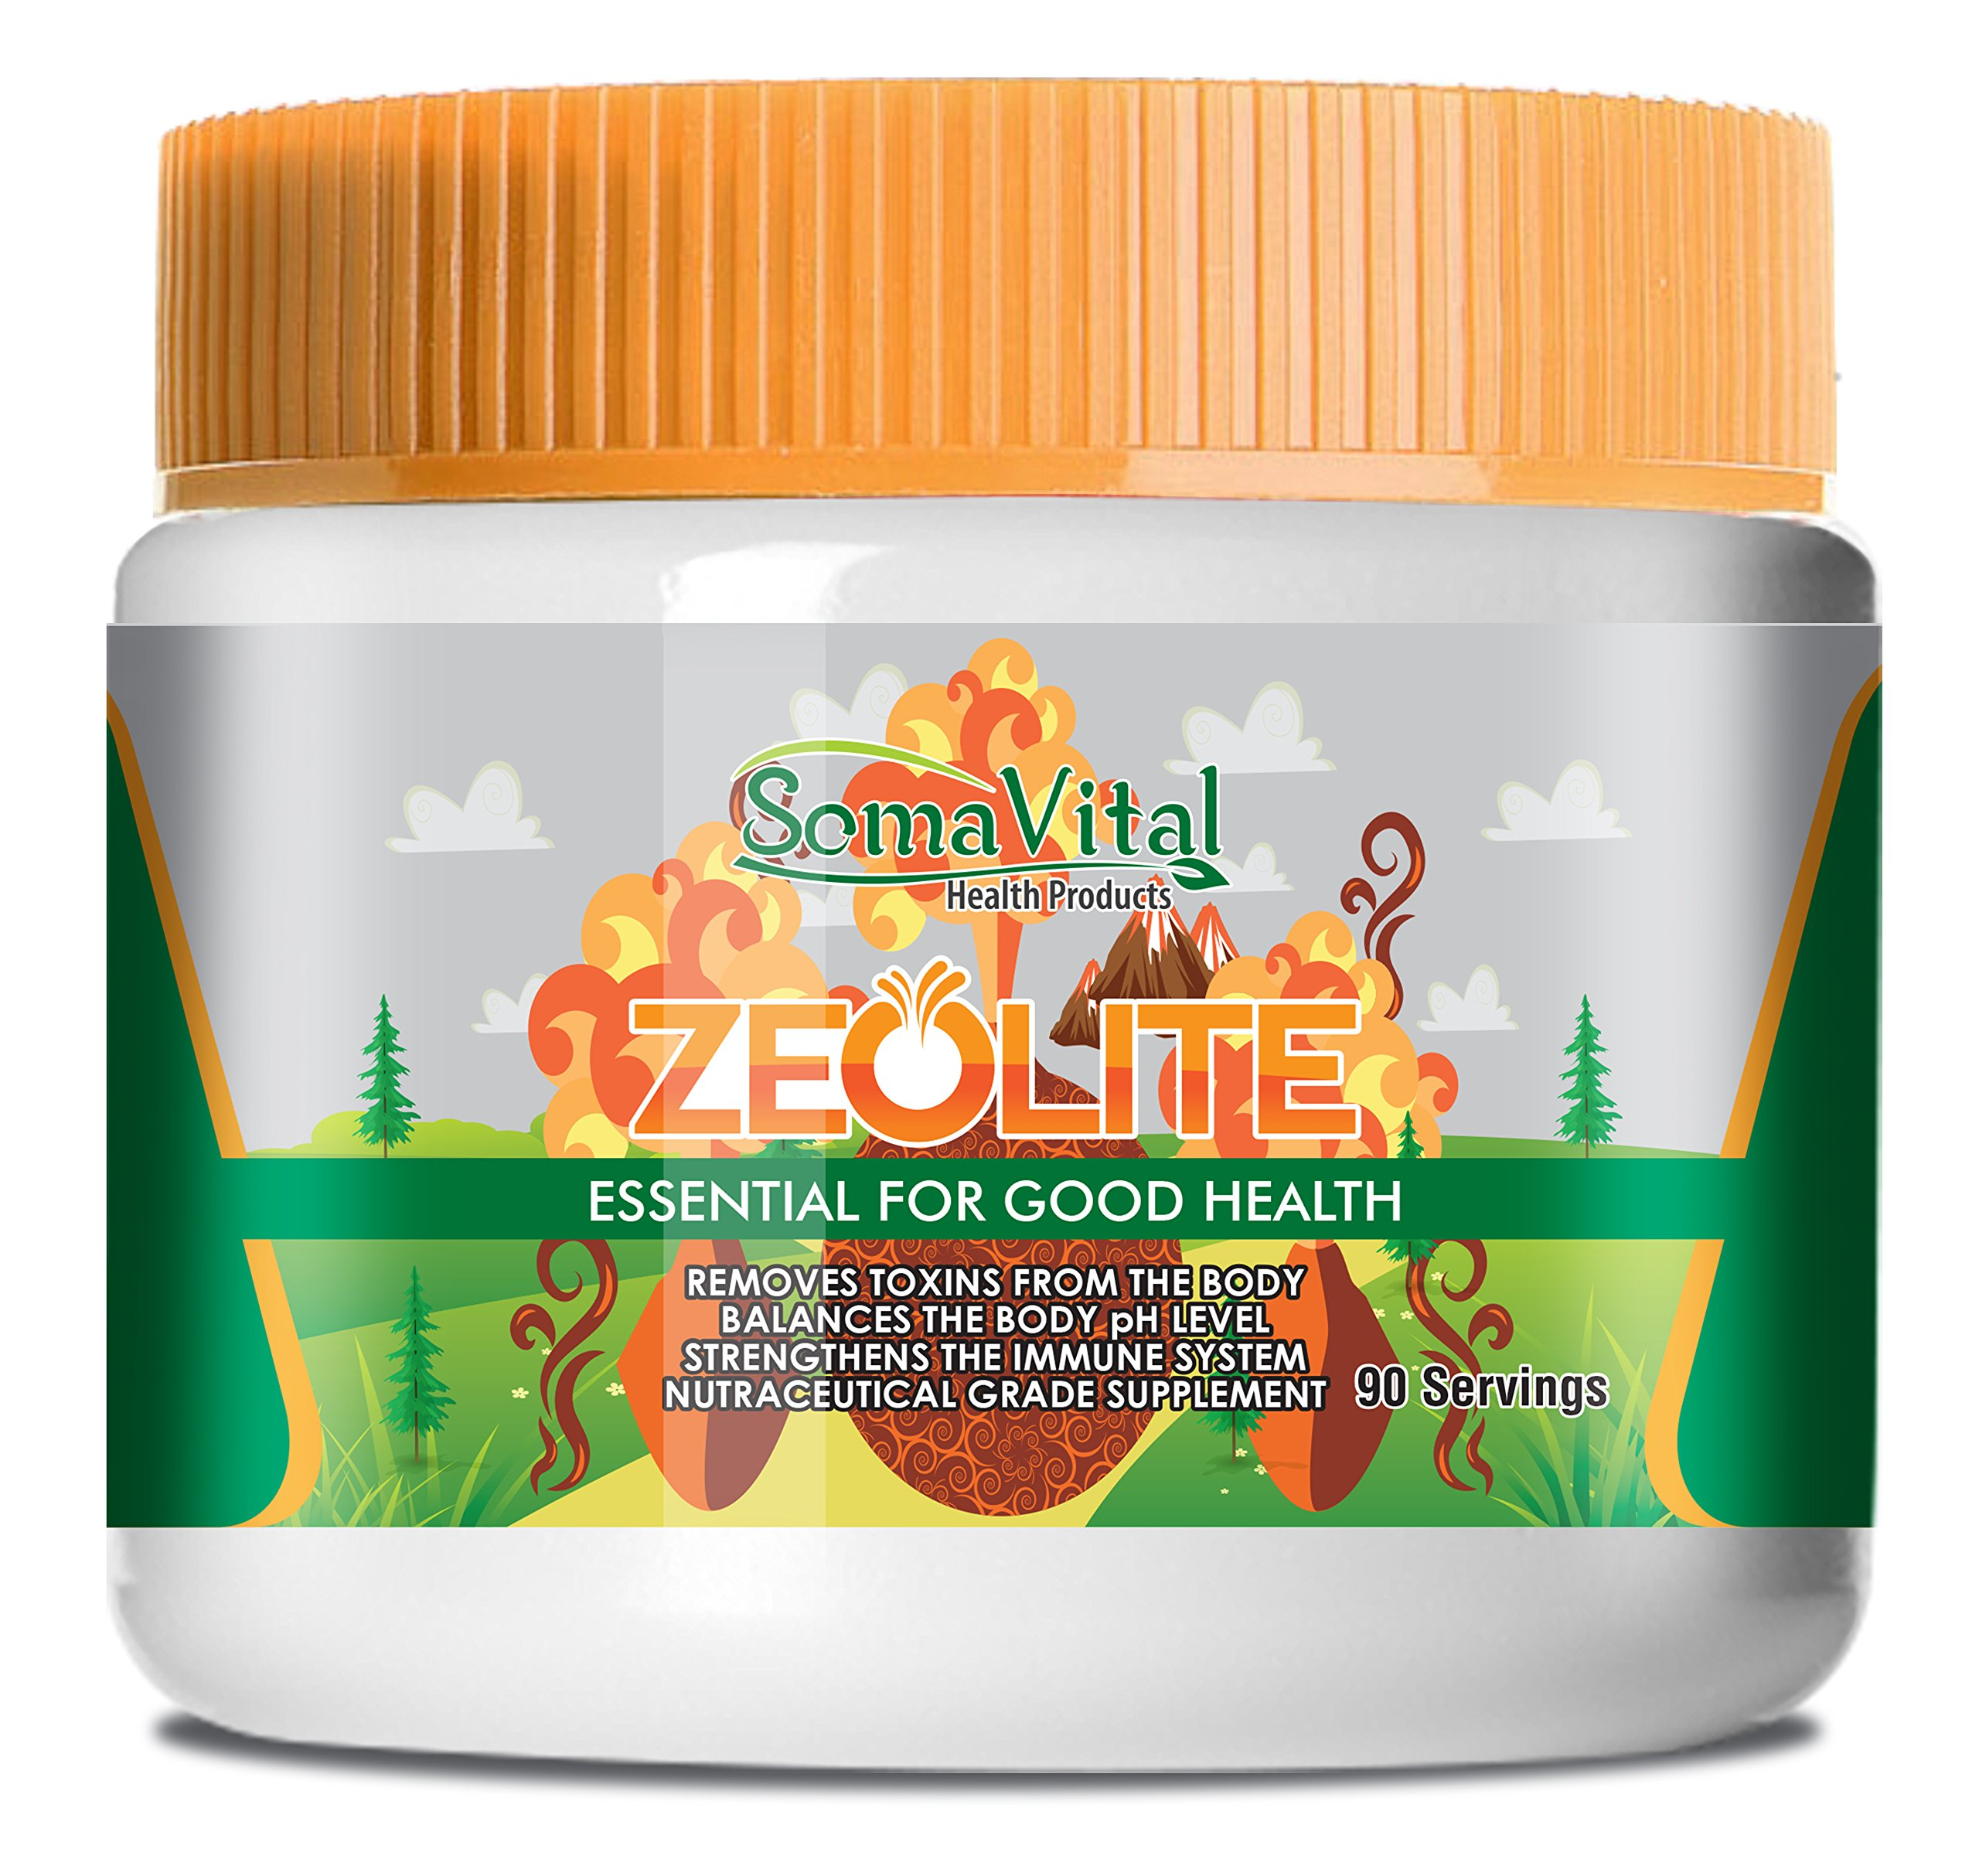 SomaVital Zeolite Powder Removes Toxins, Improves Immune System, Balances pH Level, Normalizes Blood Pressure. 100% Organic, Ultra Fine, GMO Free, Gluten Free, Vegan, Odorless, Tasteless 90 Servings